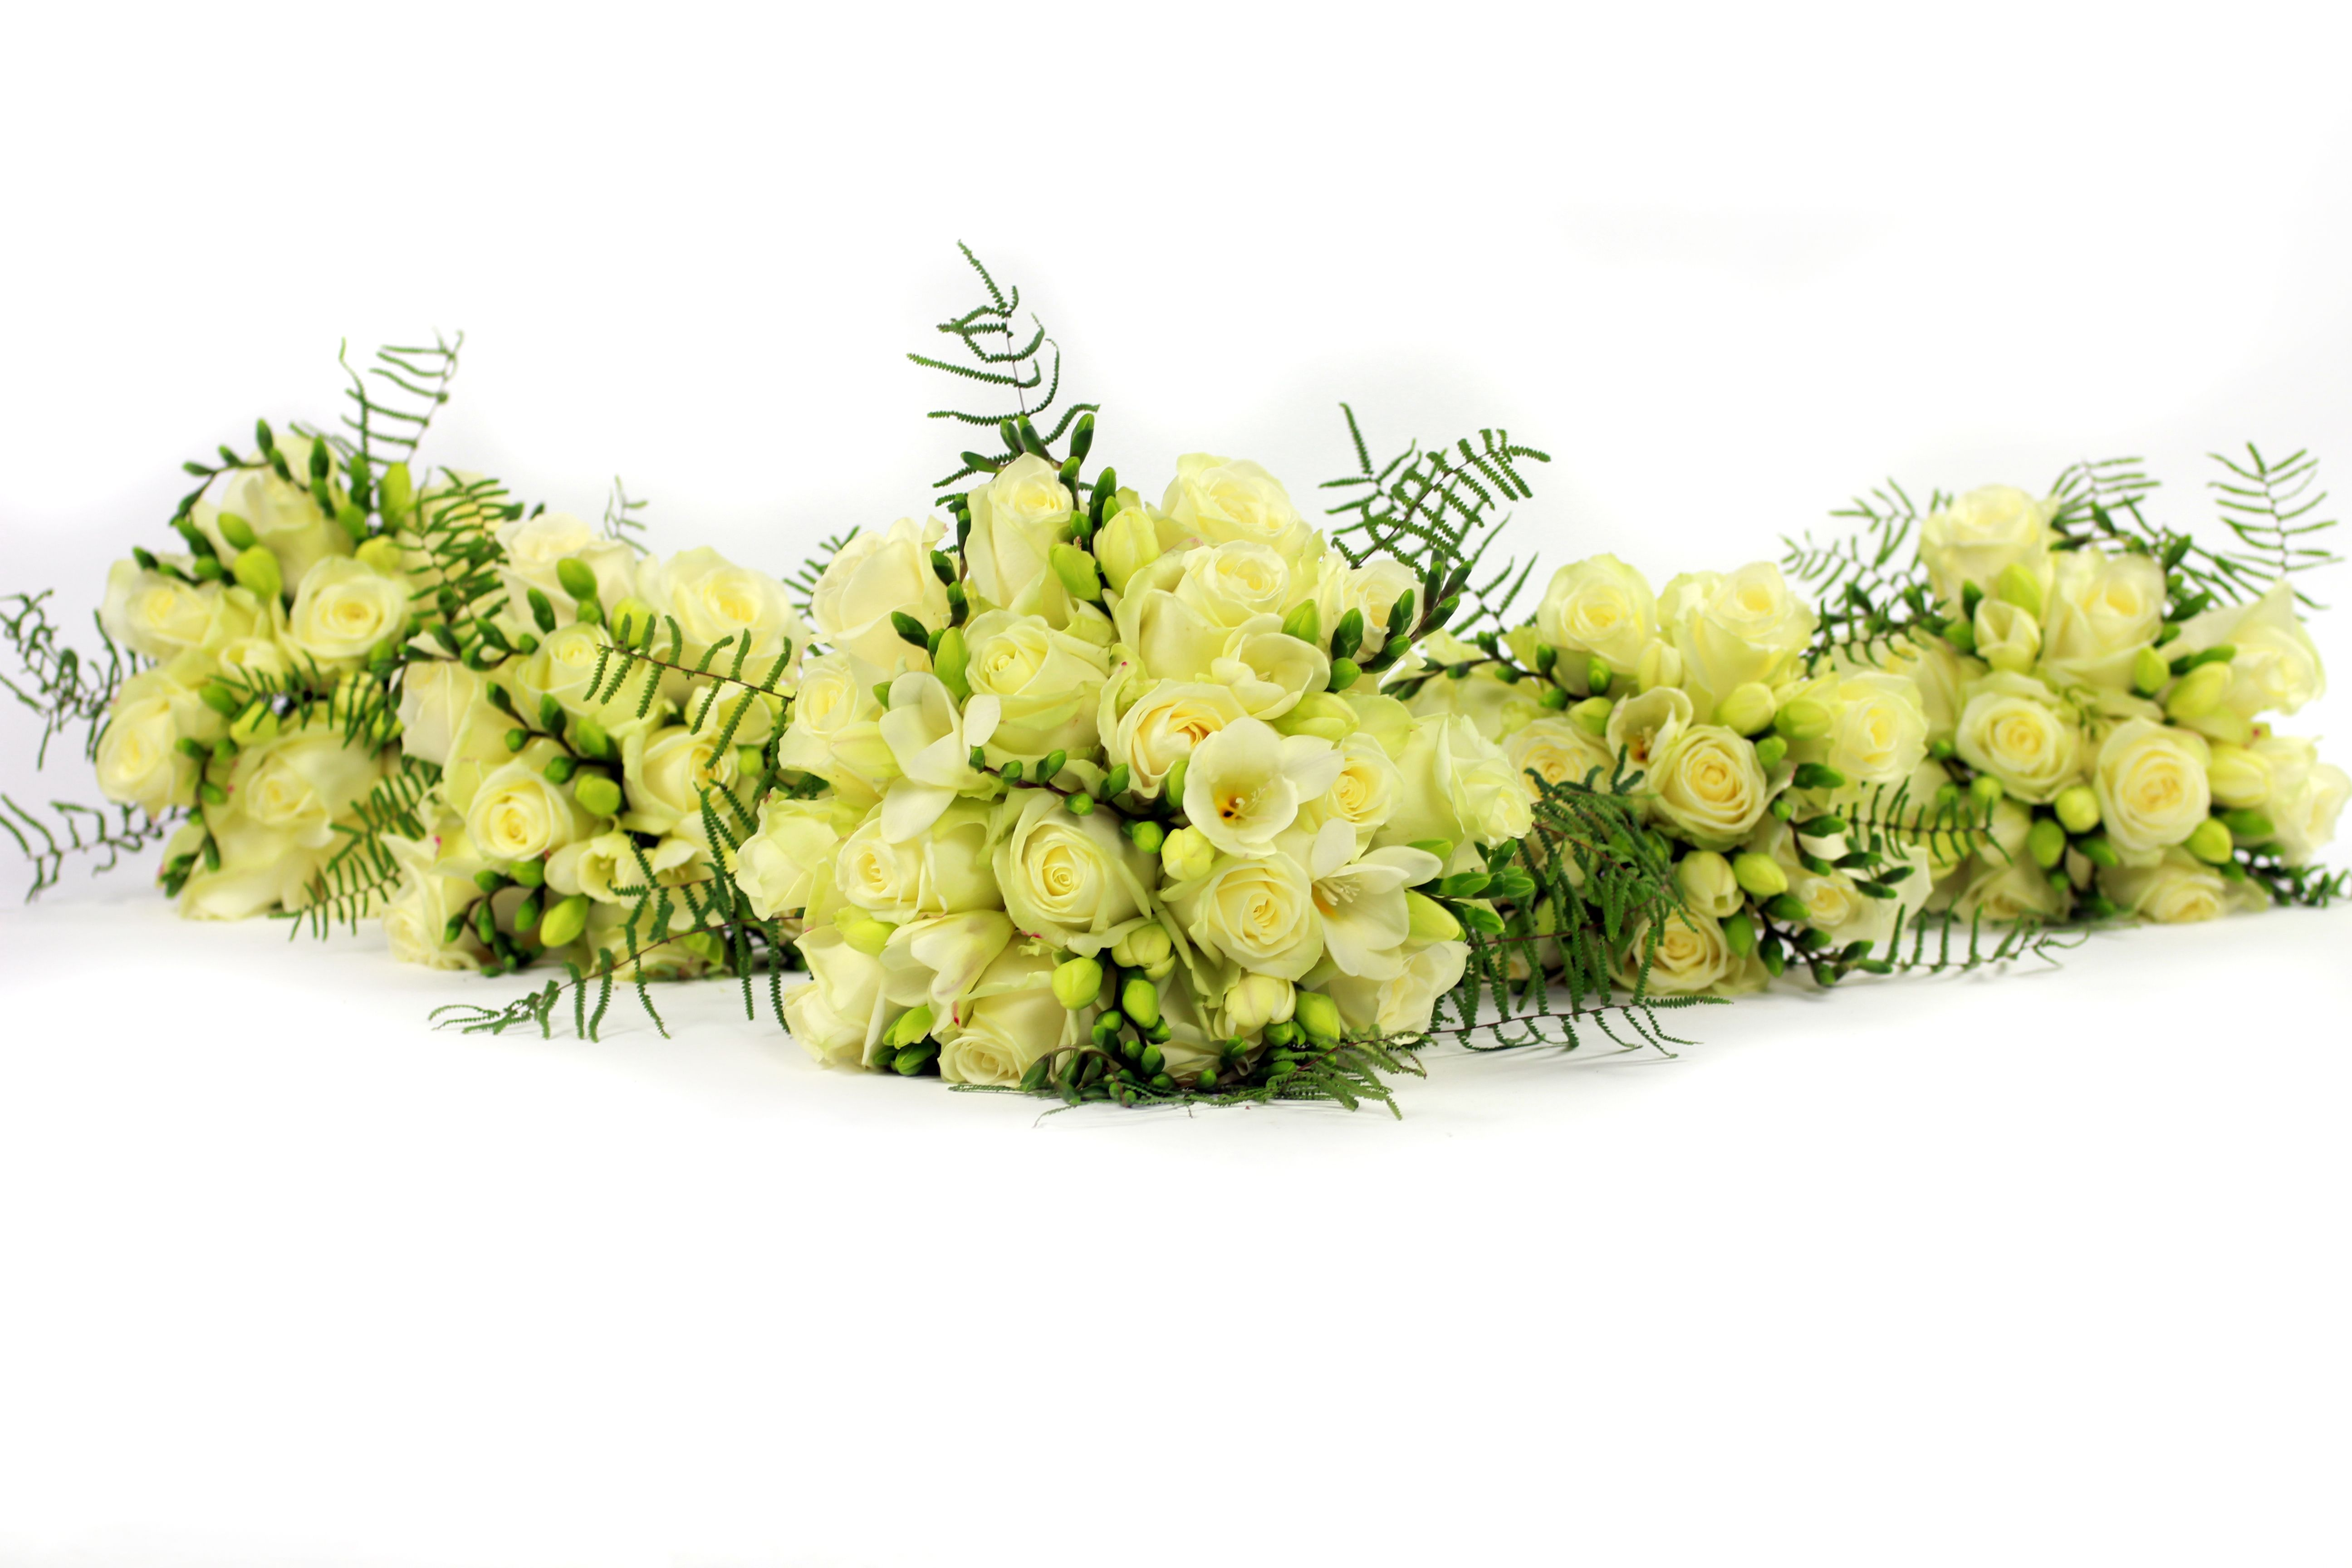 Wedding Flowers Google Search Flower Bouquet Png Flowers Bouquet Watercolor Flower Wedding